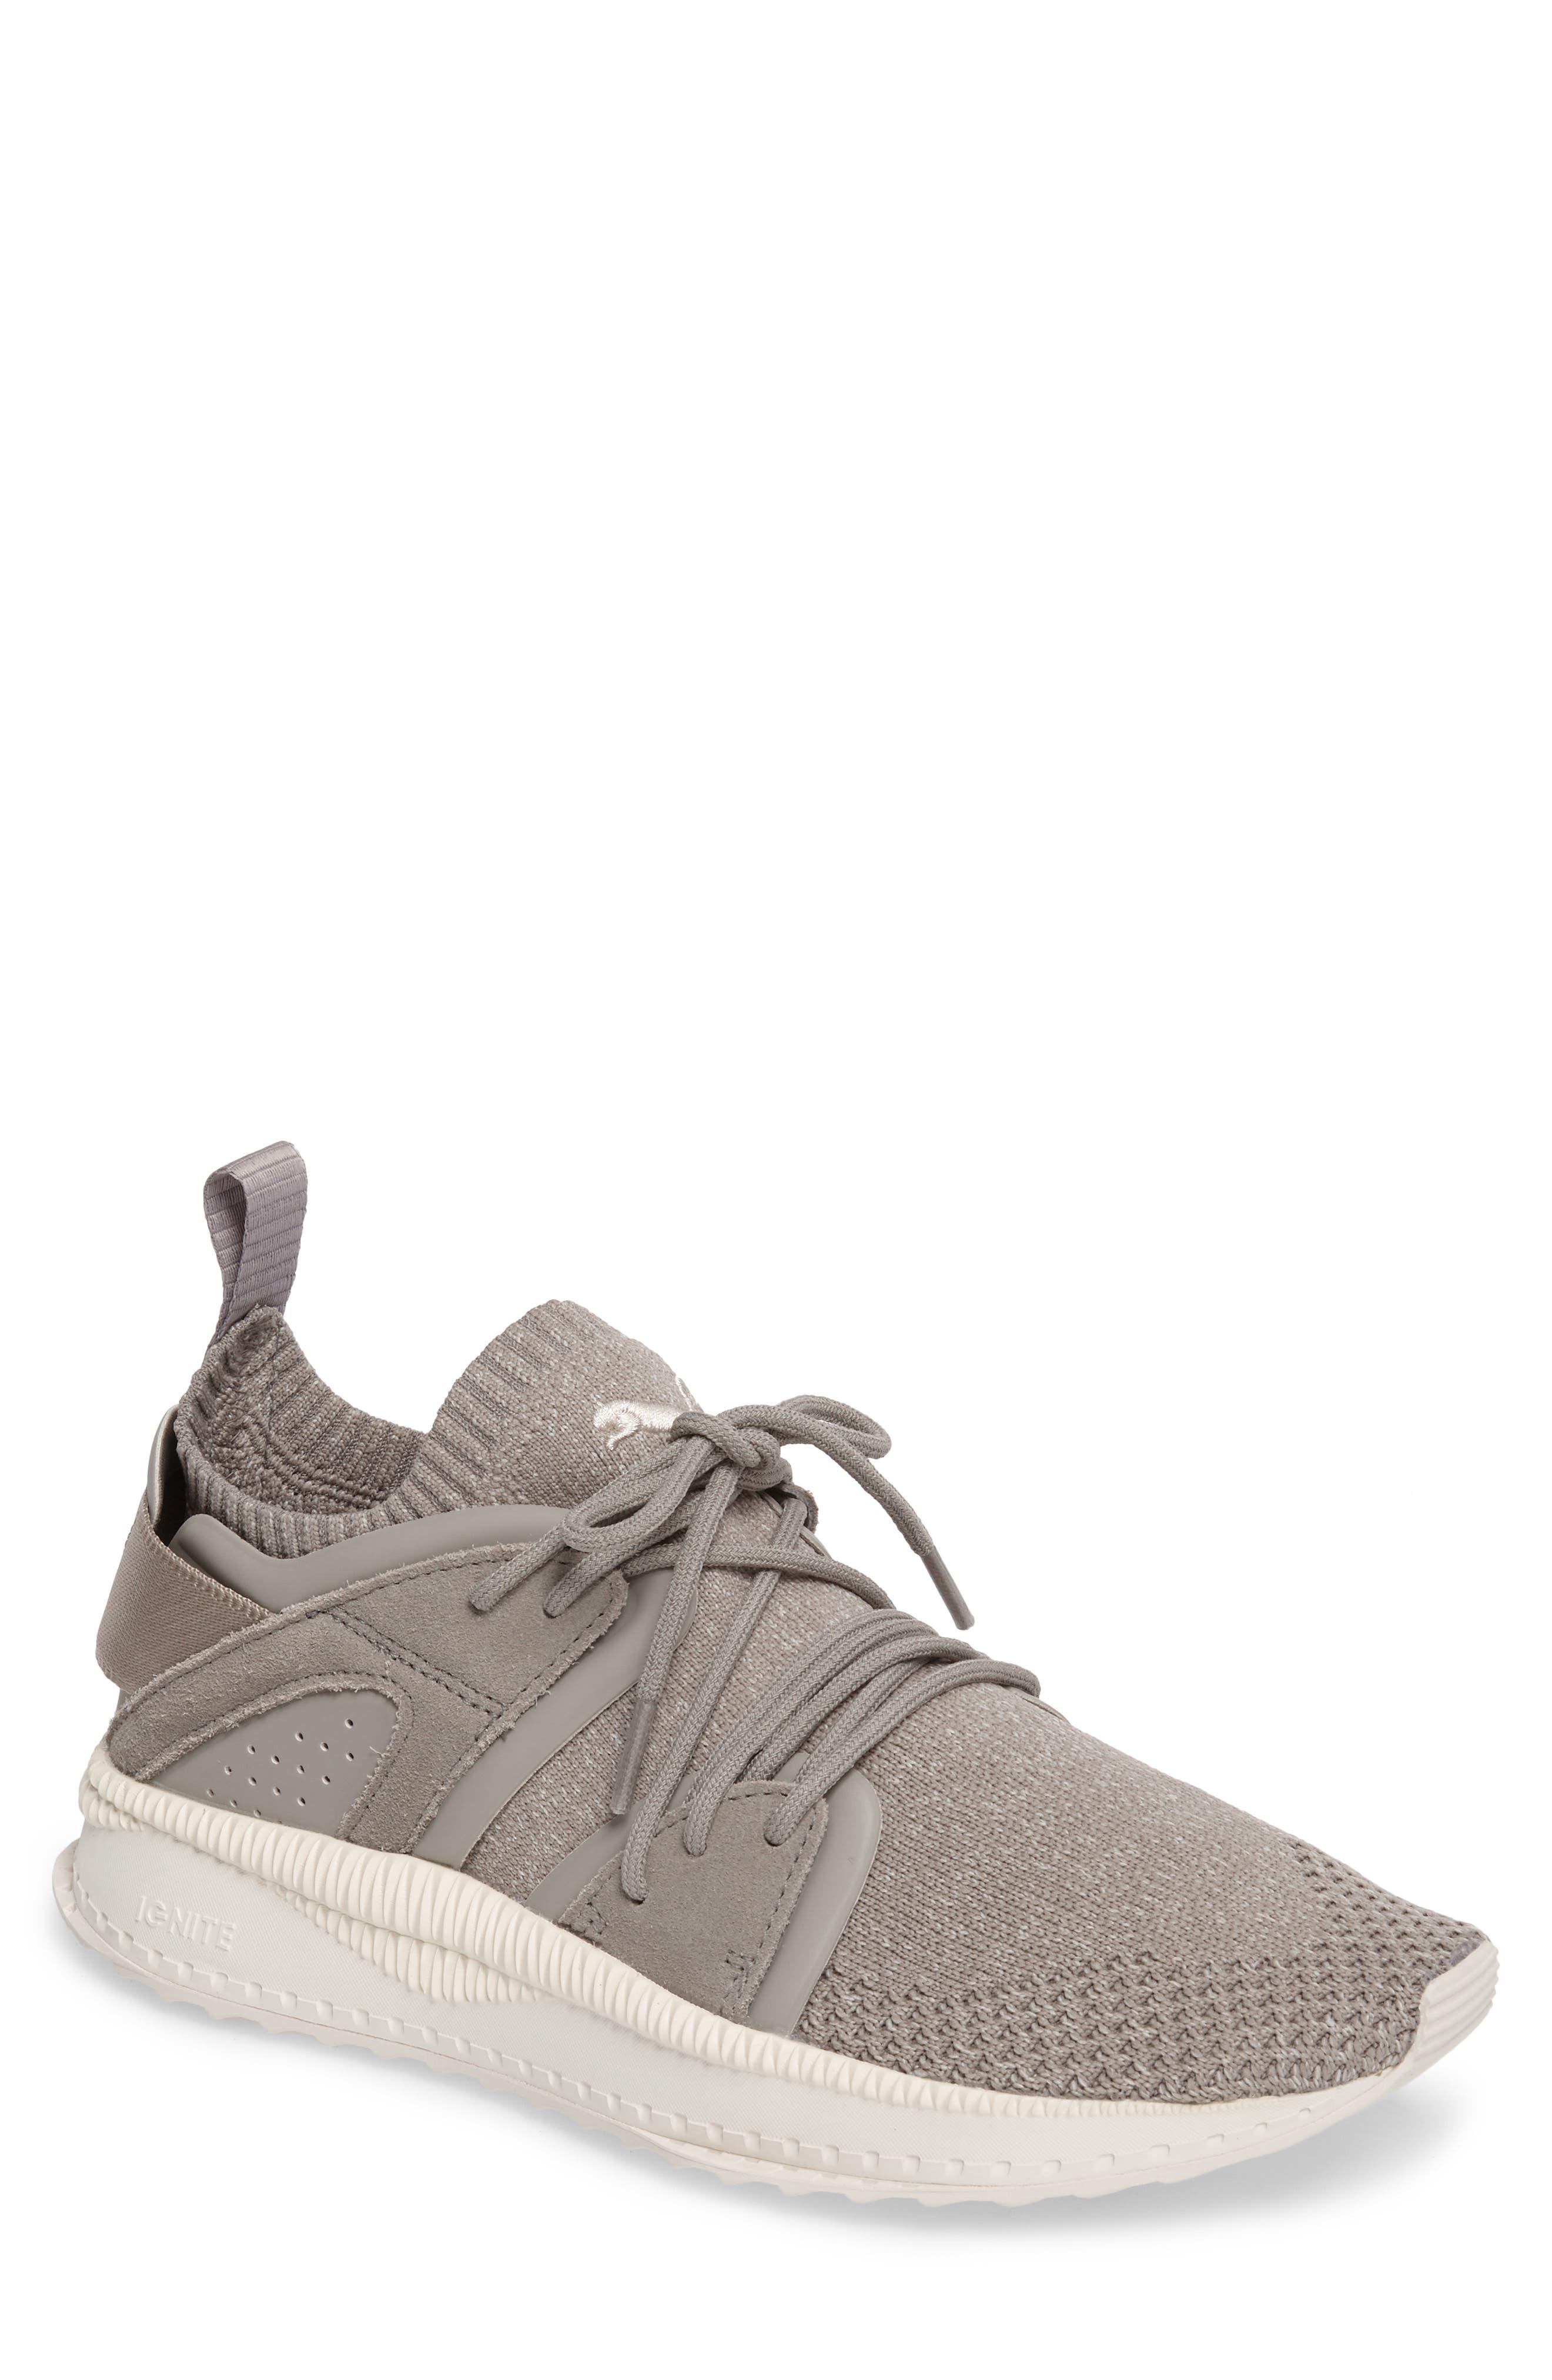 PUMA Tsug Blaze Evoknit Sneaker (Men)